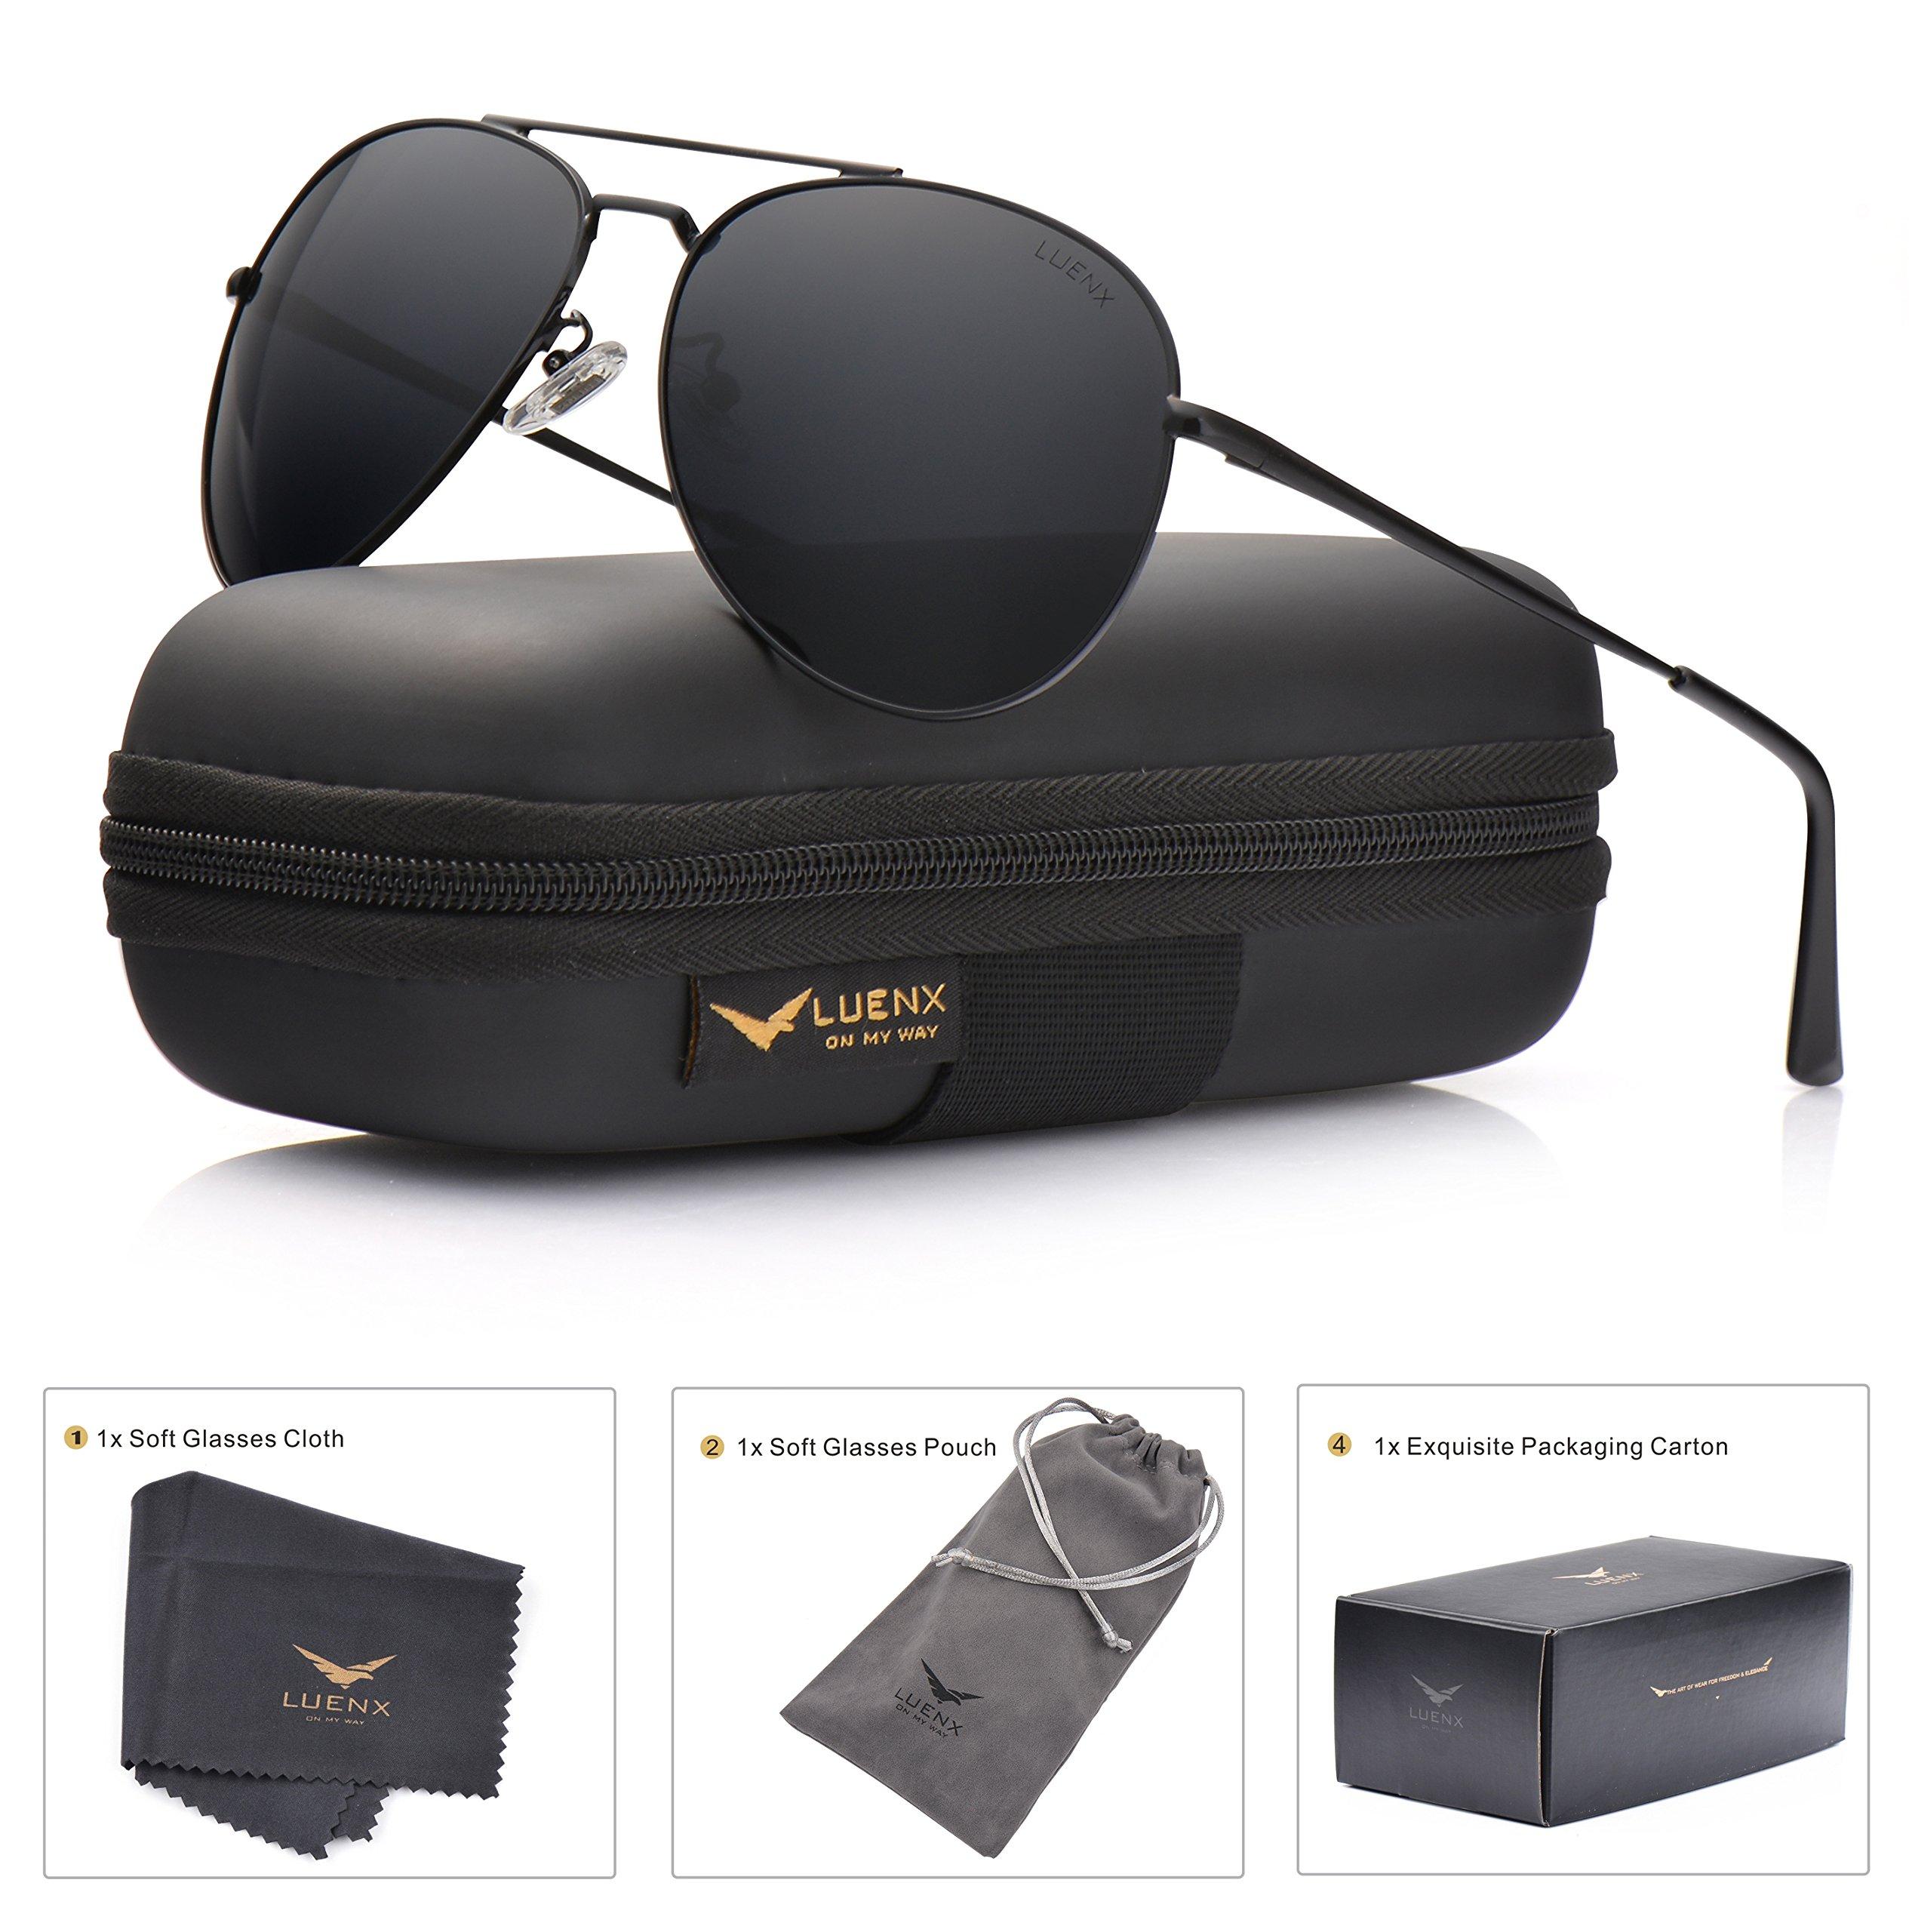 LUENX Aviator Sunglasses Men Women Polarized with Case - UV 400 Non-Mirror Black Lens Metal Black Frame 60mm